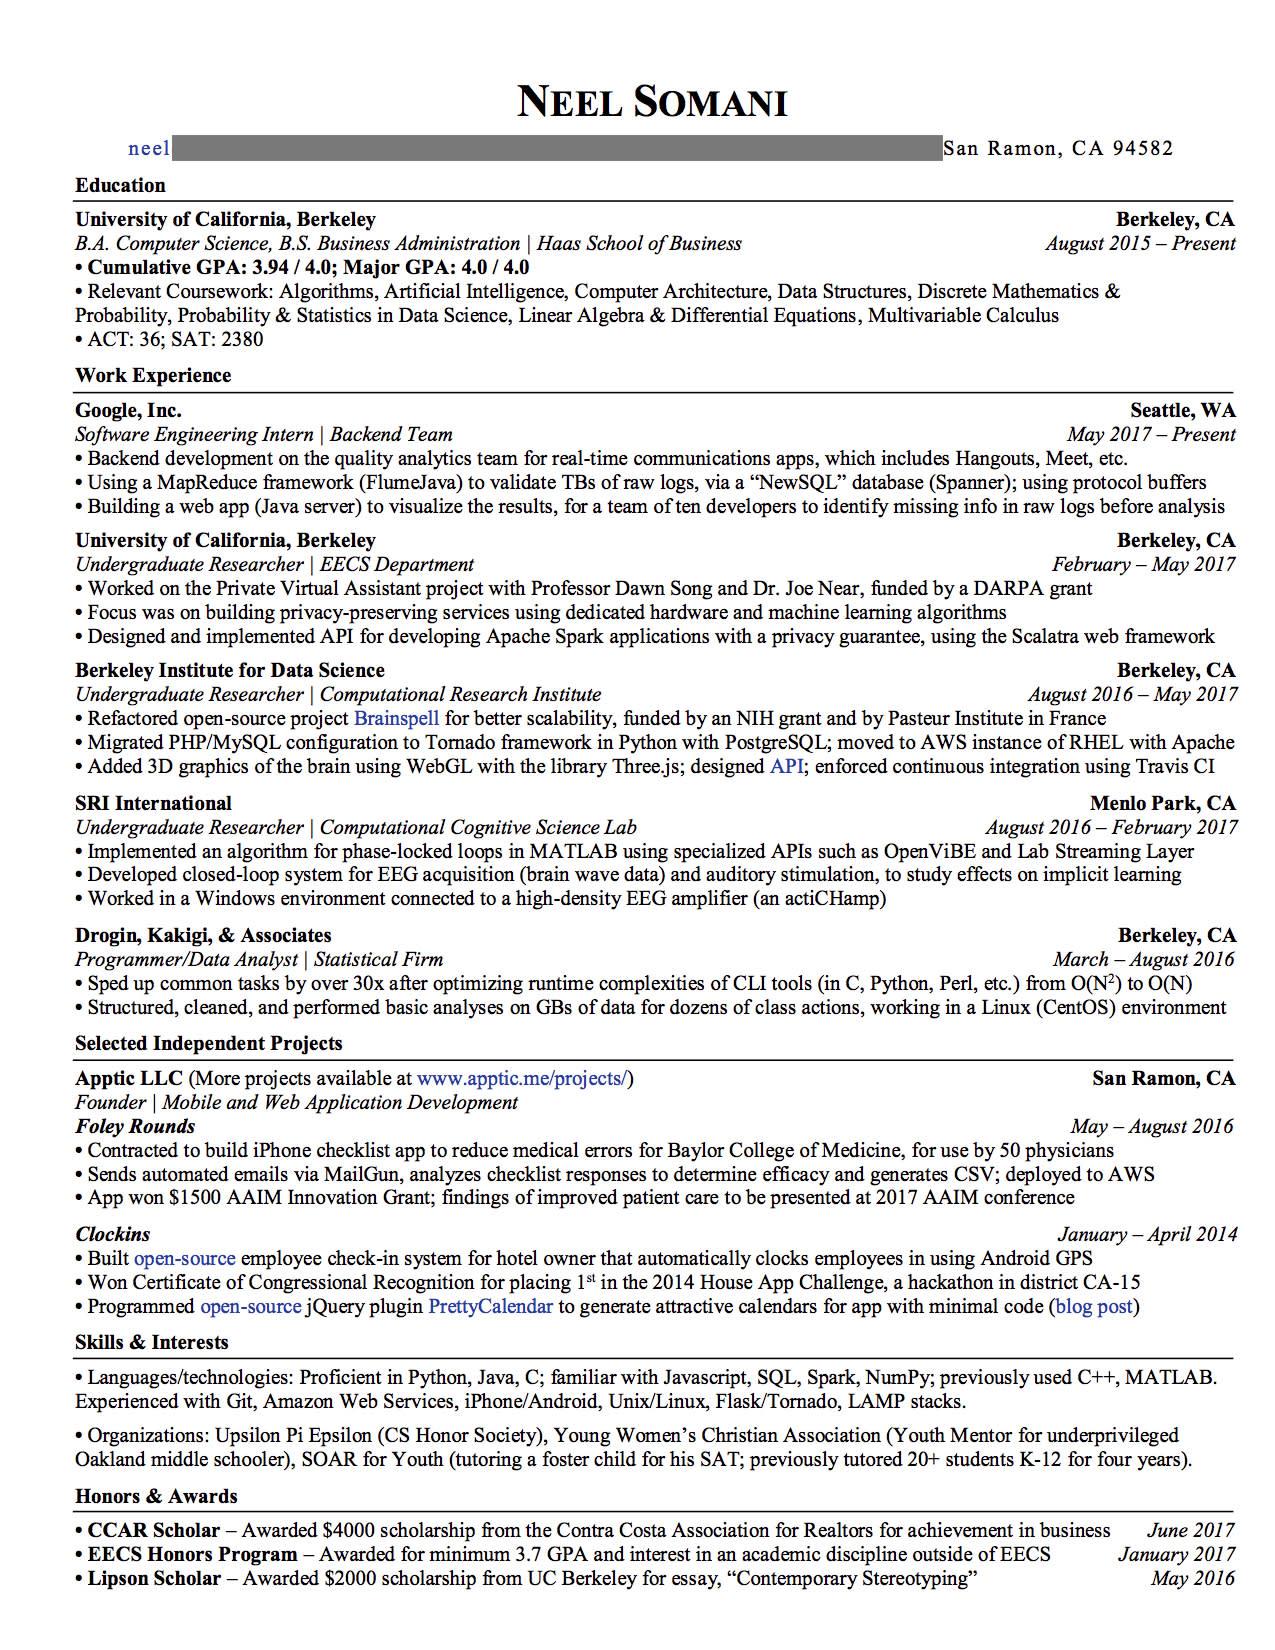 One time use: Glassdoor resume